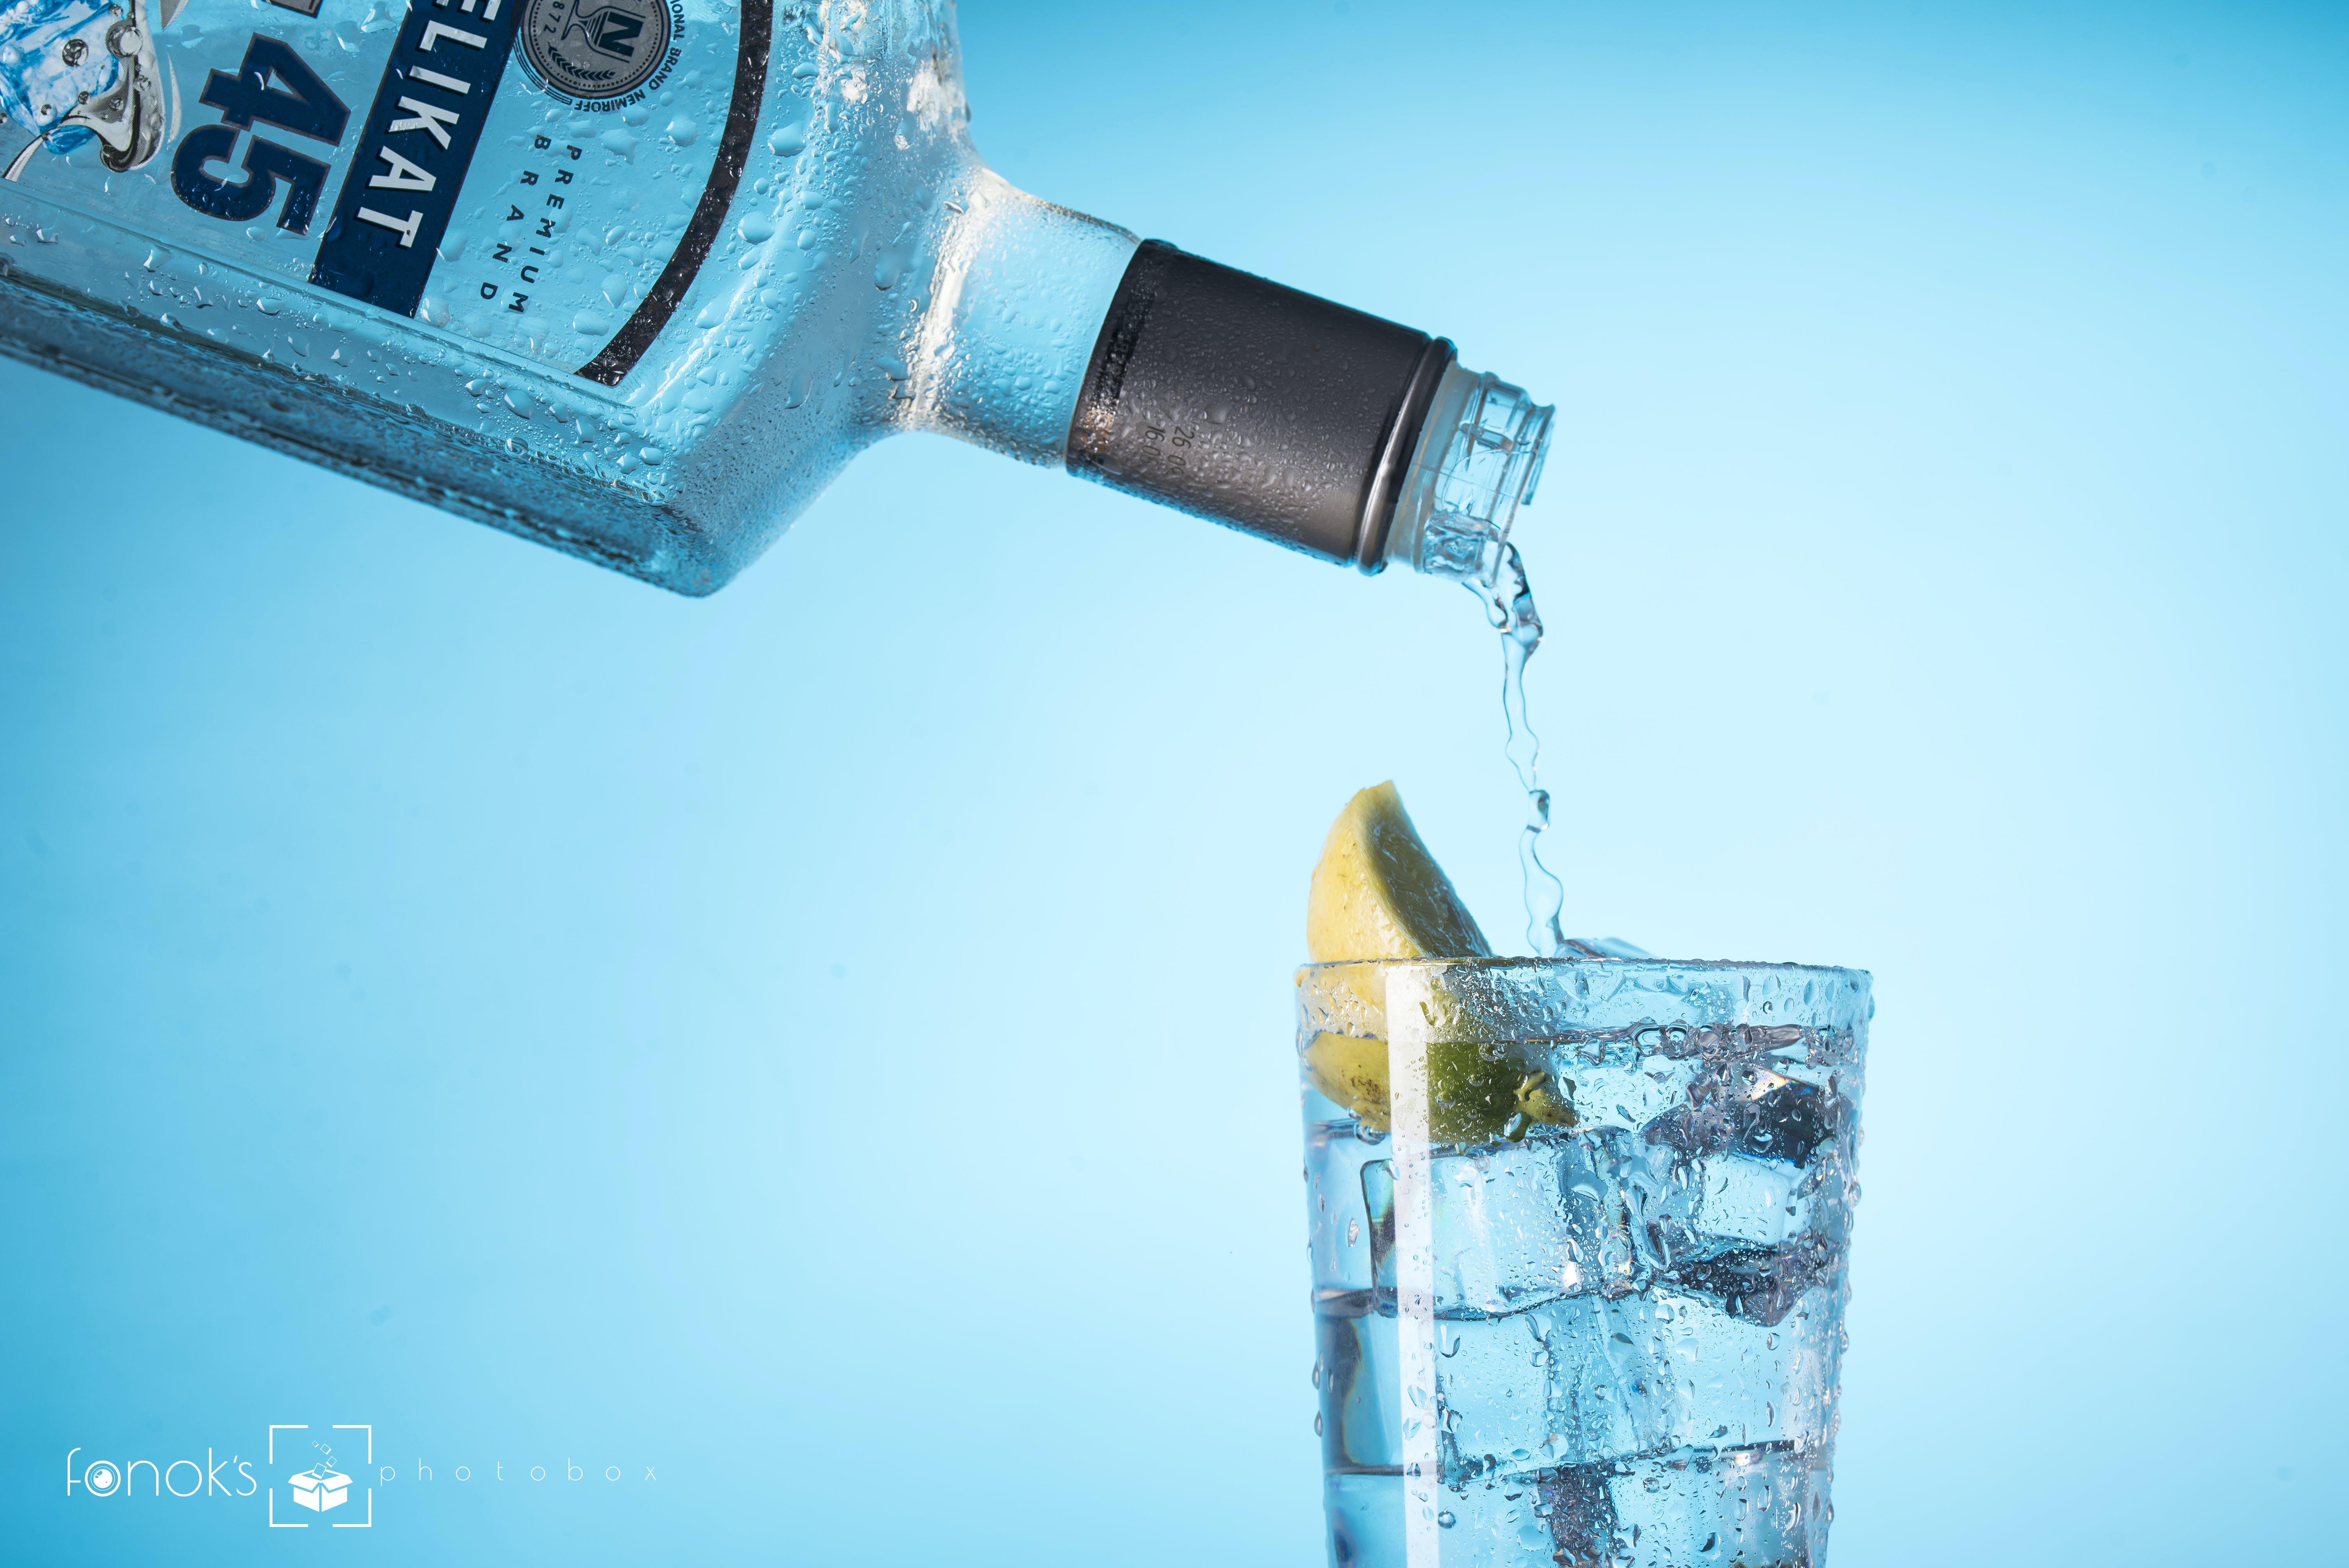 Free stock photo of #alcohol, #beveragephotography, #commercialphotographer, #FonoksPhotobox